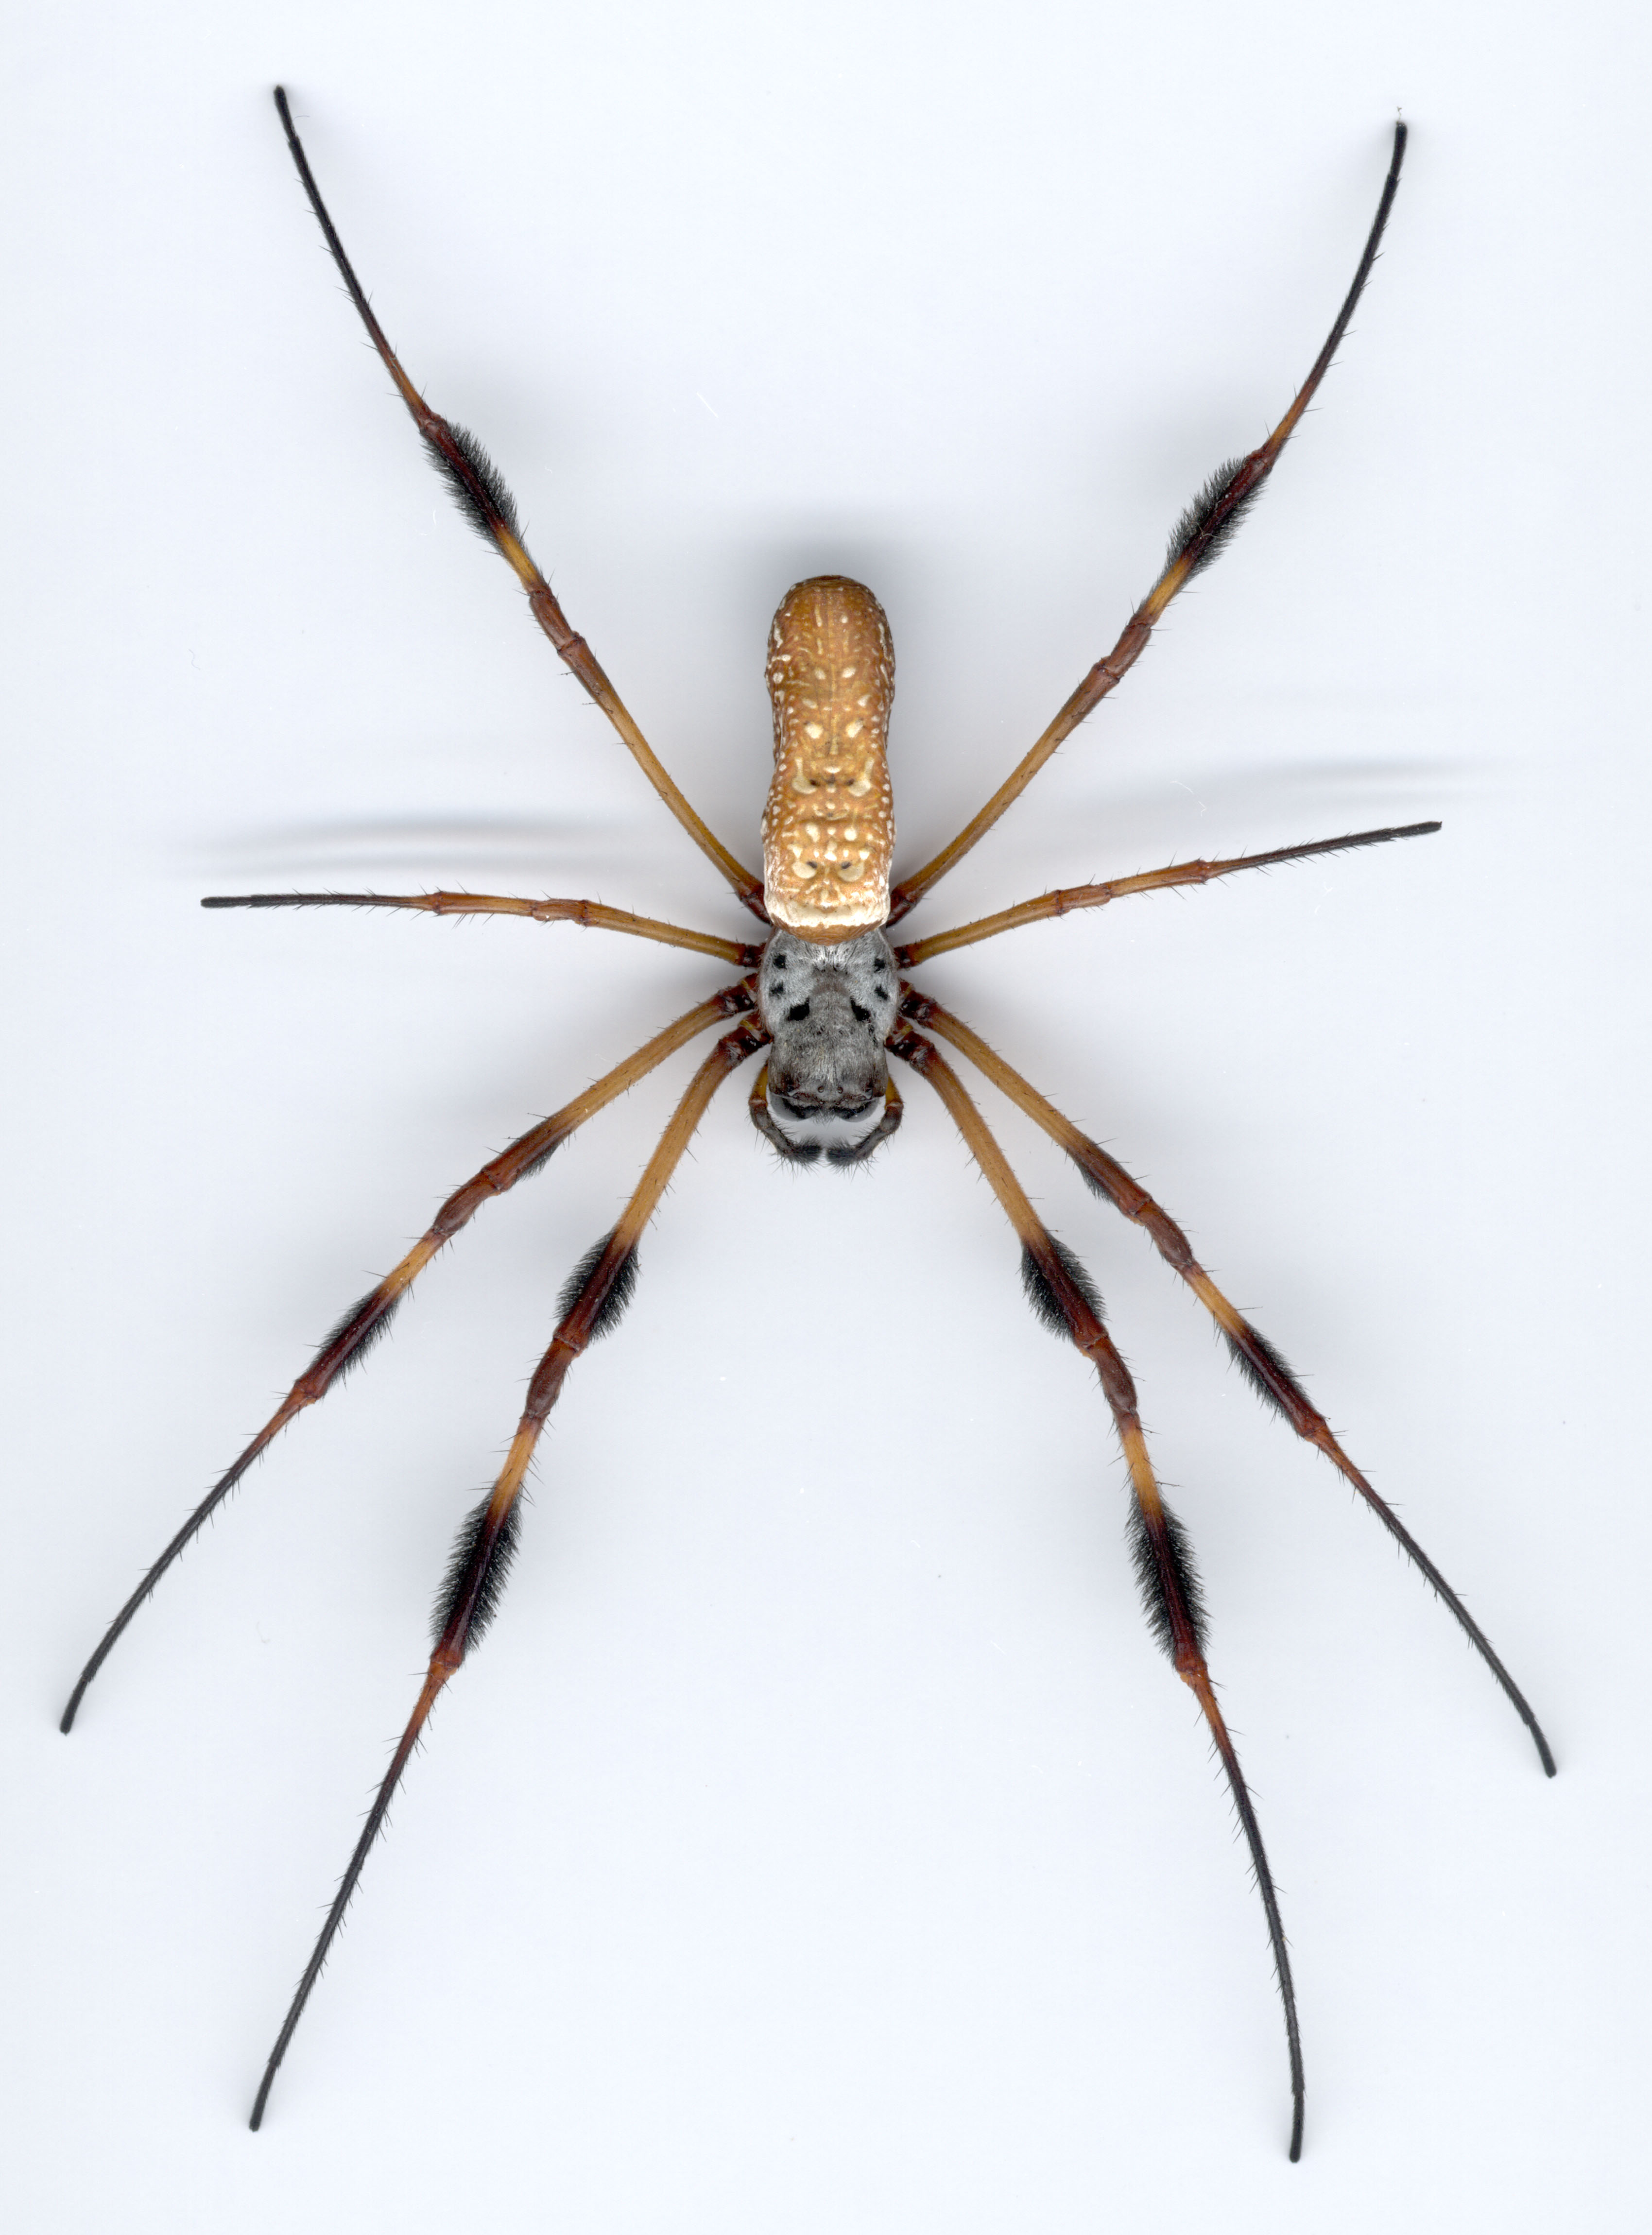 Golden Silk Orb-weaver Spider Pics, Animal Collection